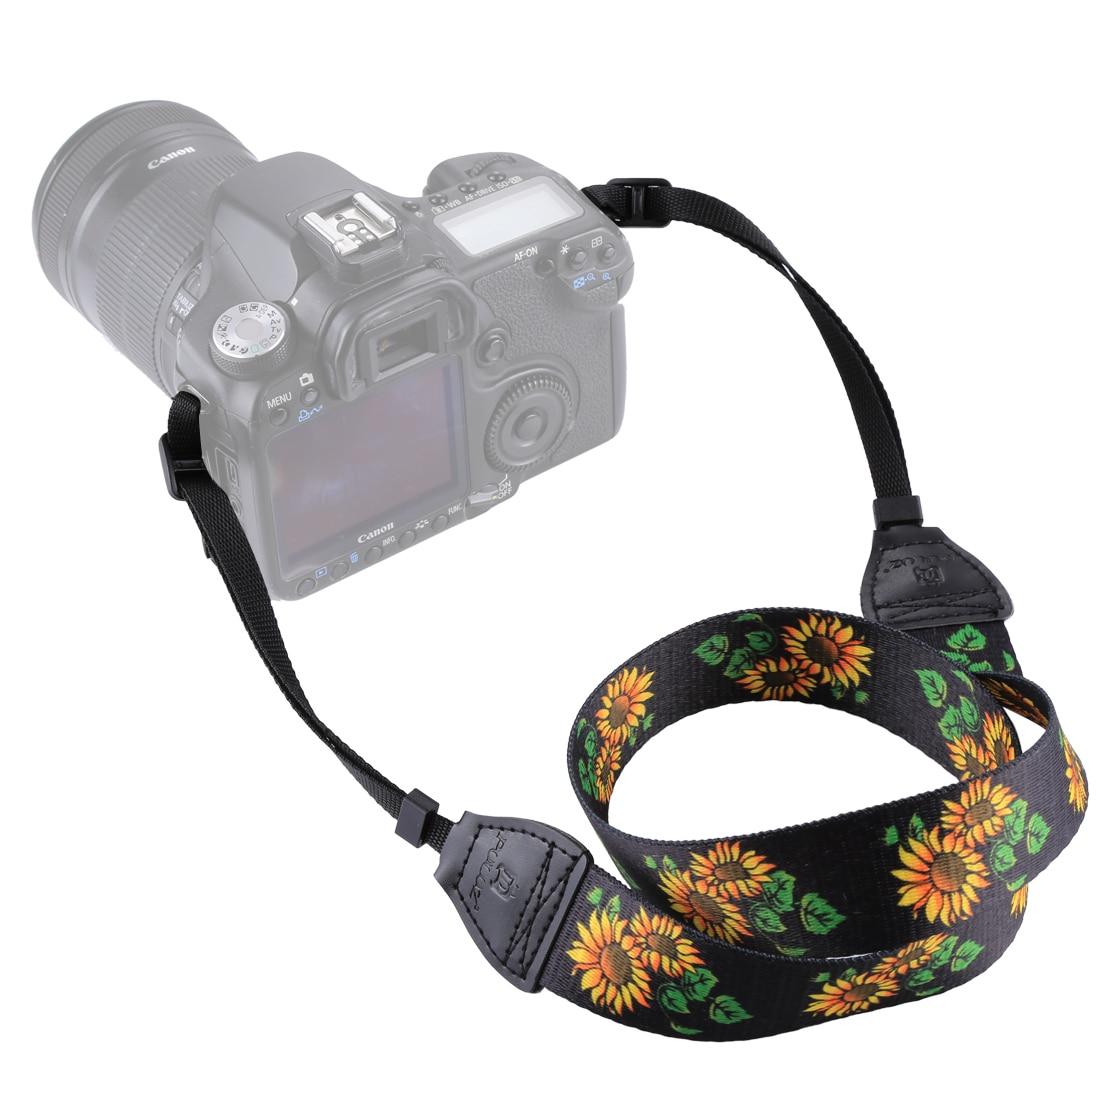 Cámara Ajustable Hombro Sling Cinturón Correa de Cuello Para Nikon Canon Sony DSLR FM